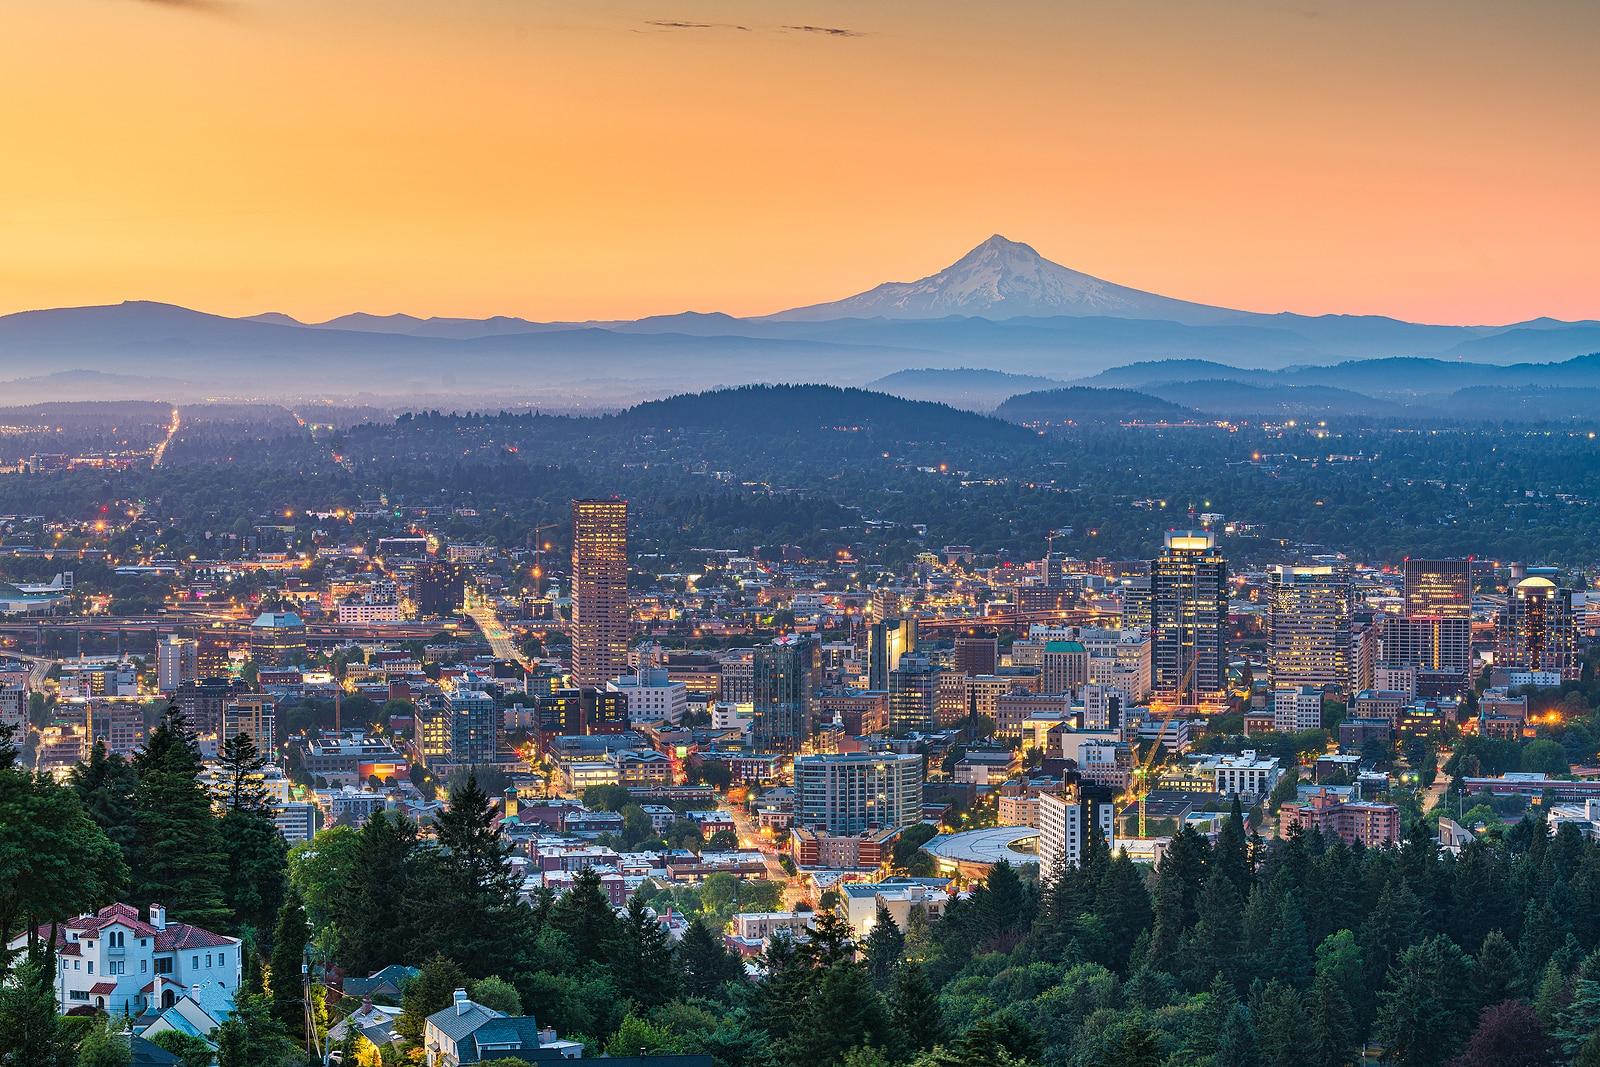 Portland, Oregon by Cooper DuBois